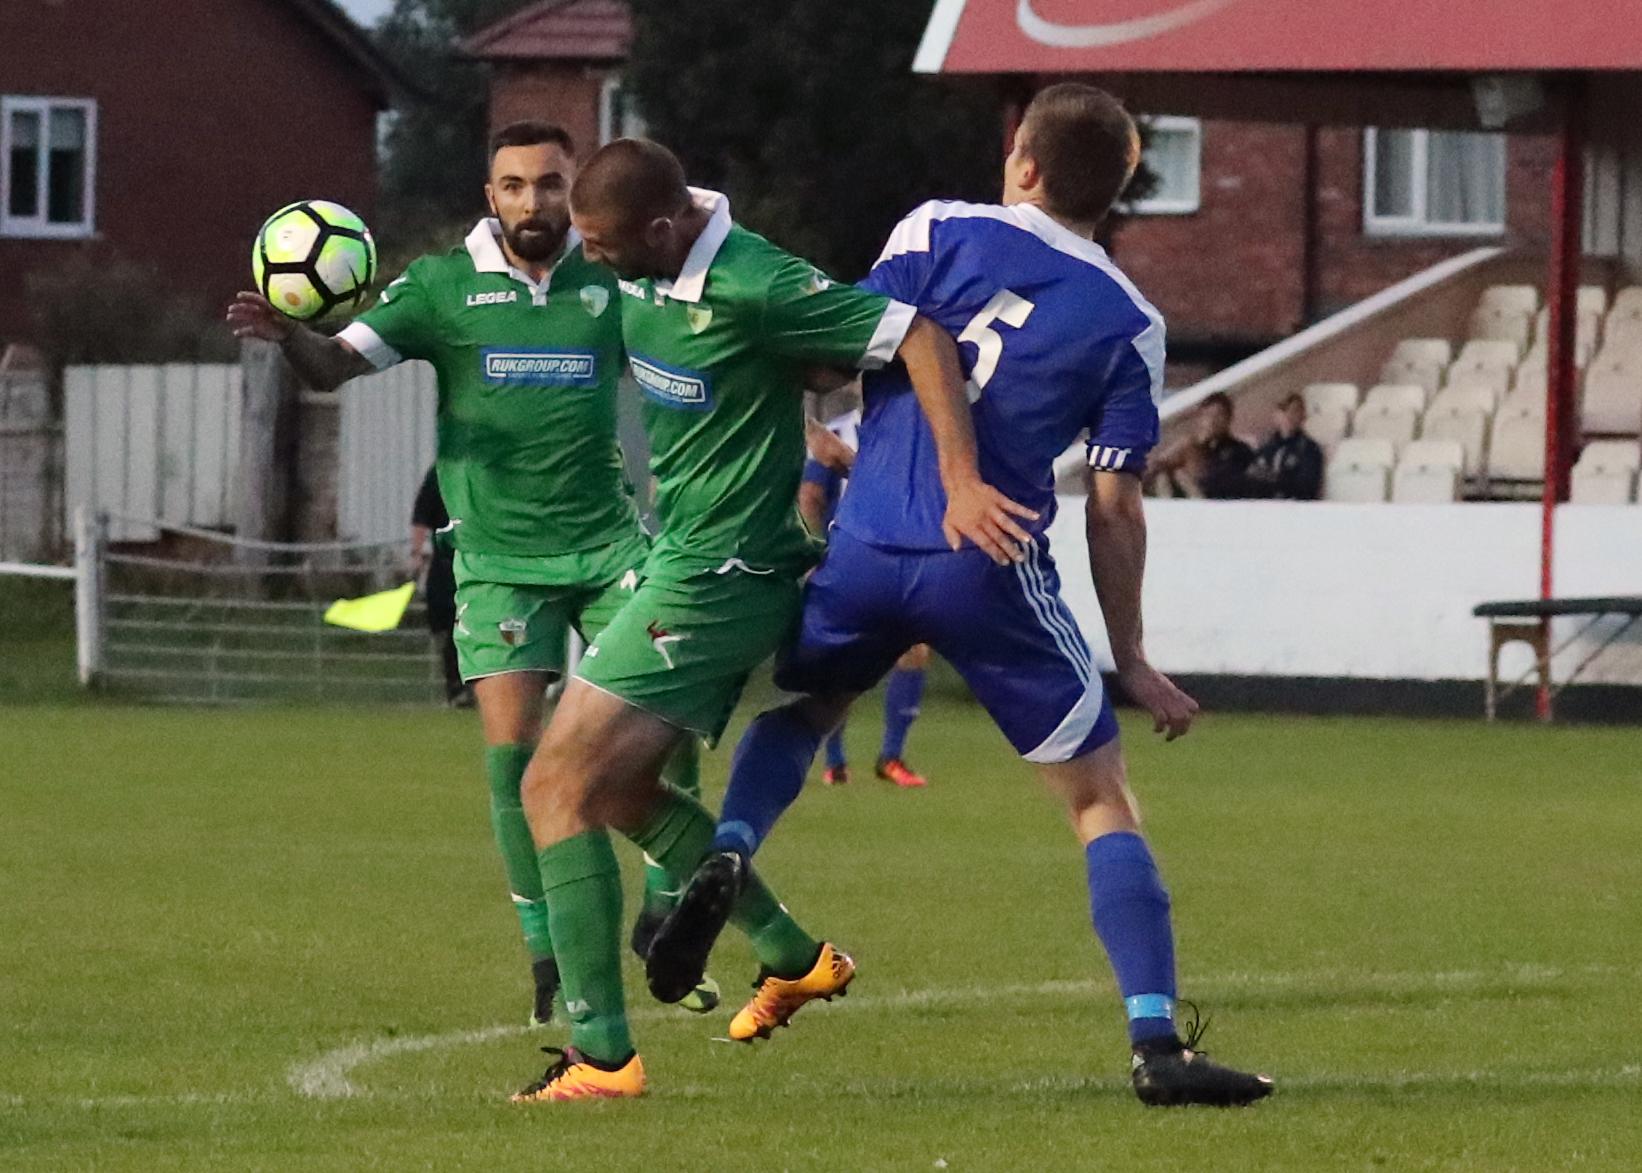 The New Saints FC 0 Shawbury United FC 1 – The Camera Never